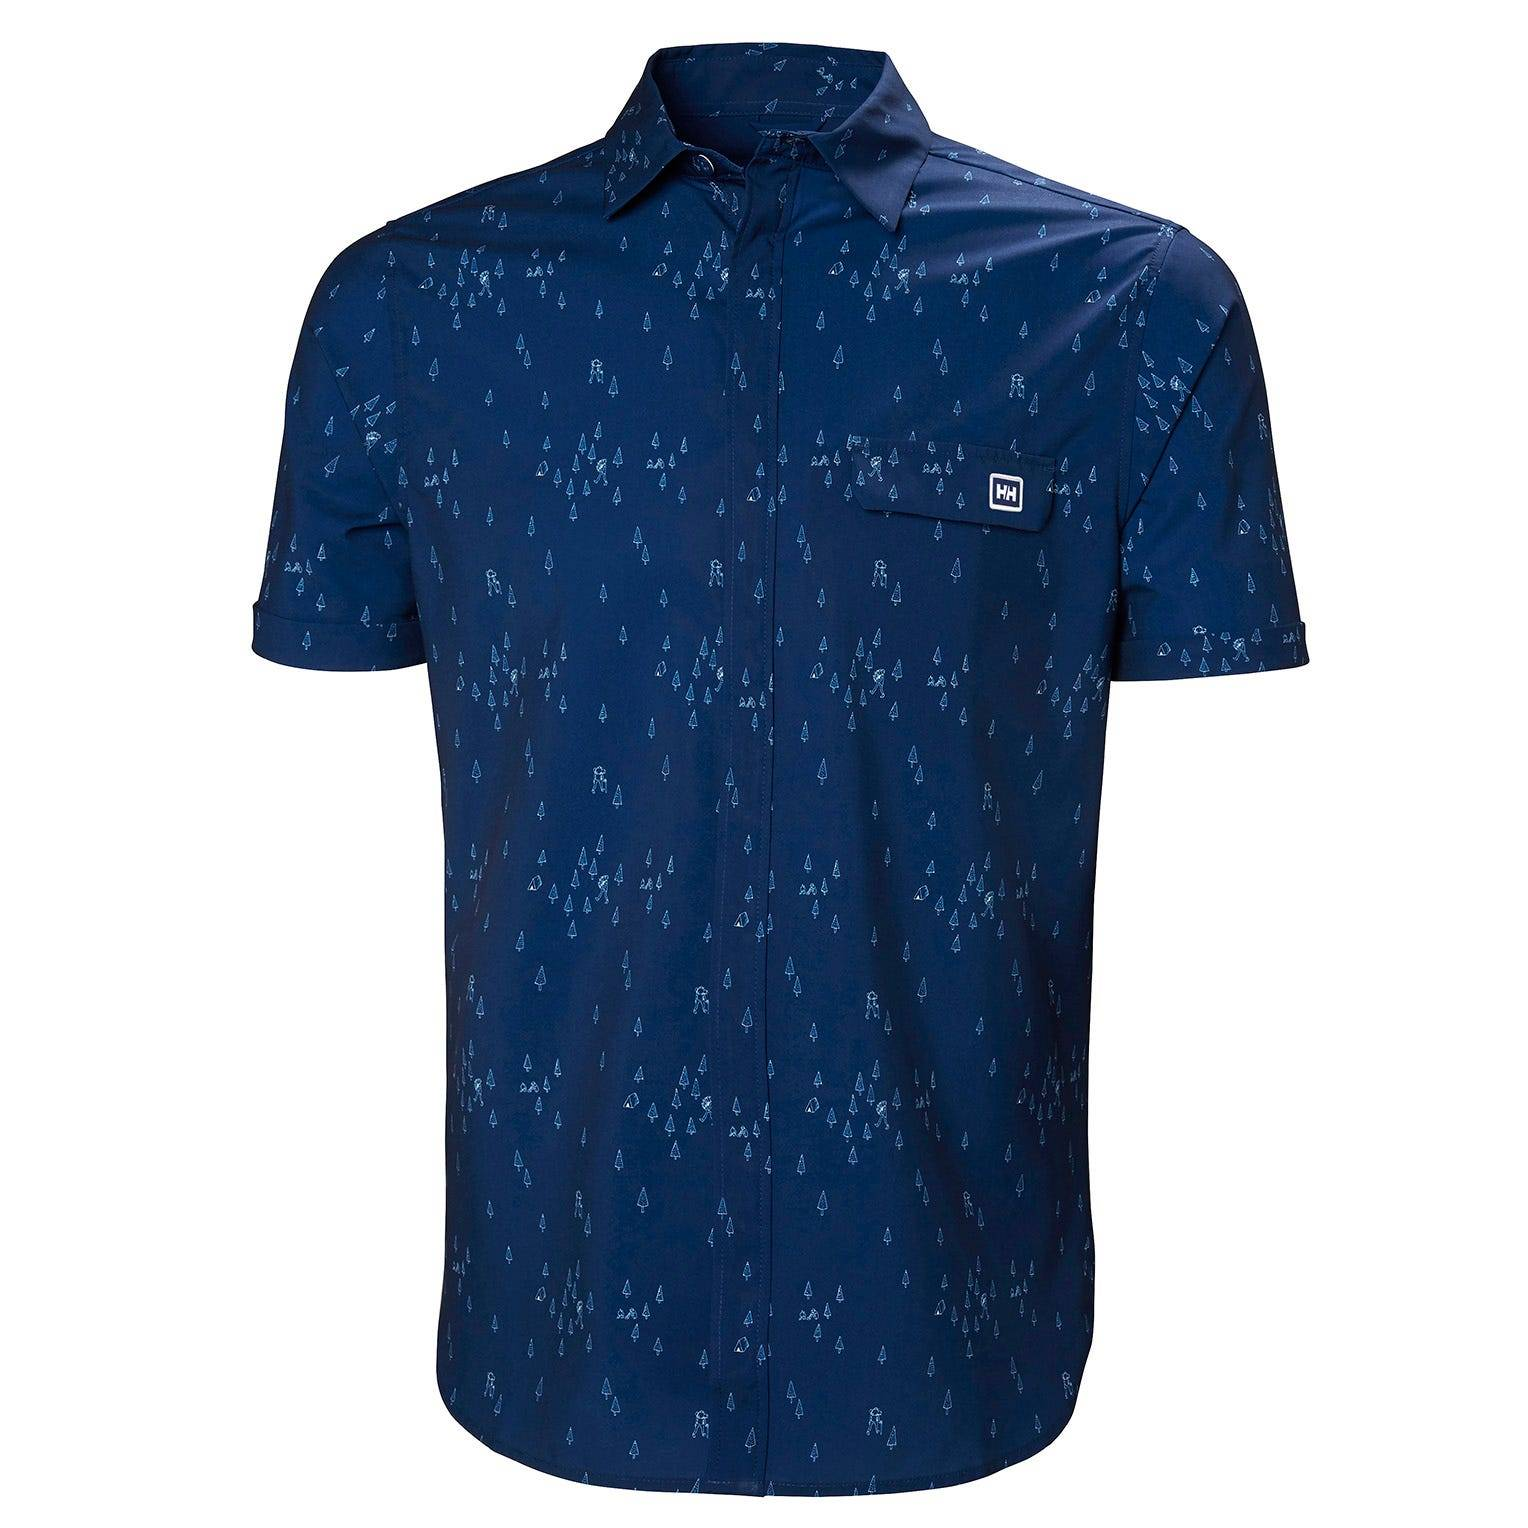 Helly Hansen Oya Shirt Blue XL